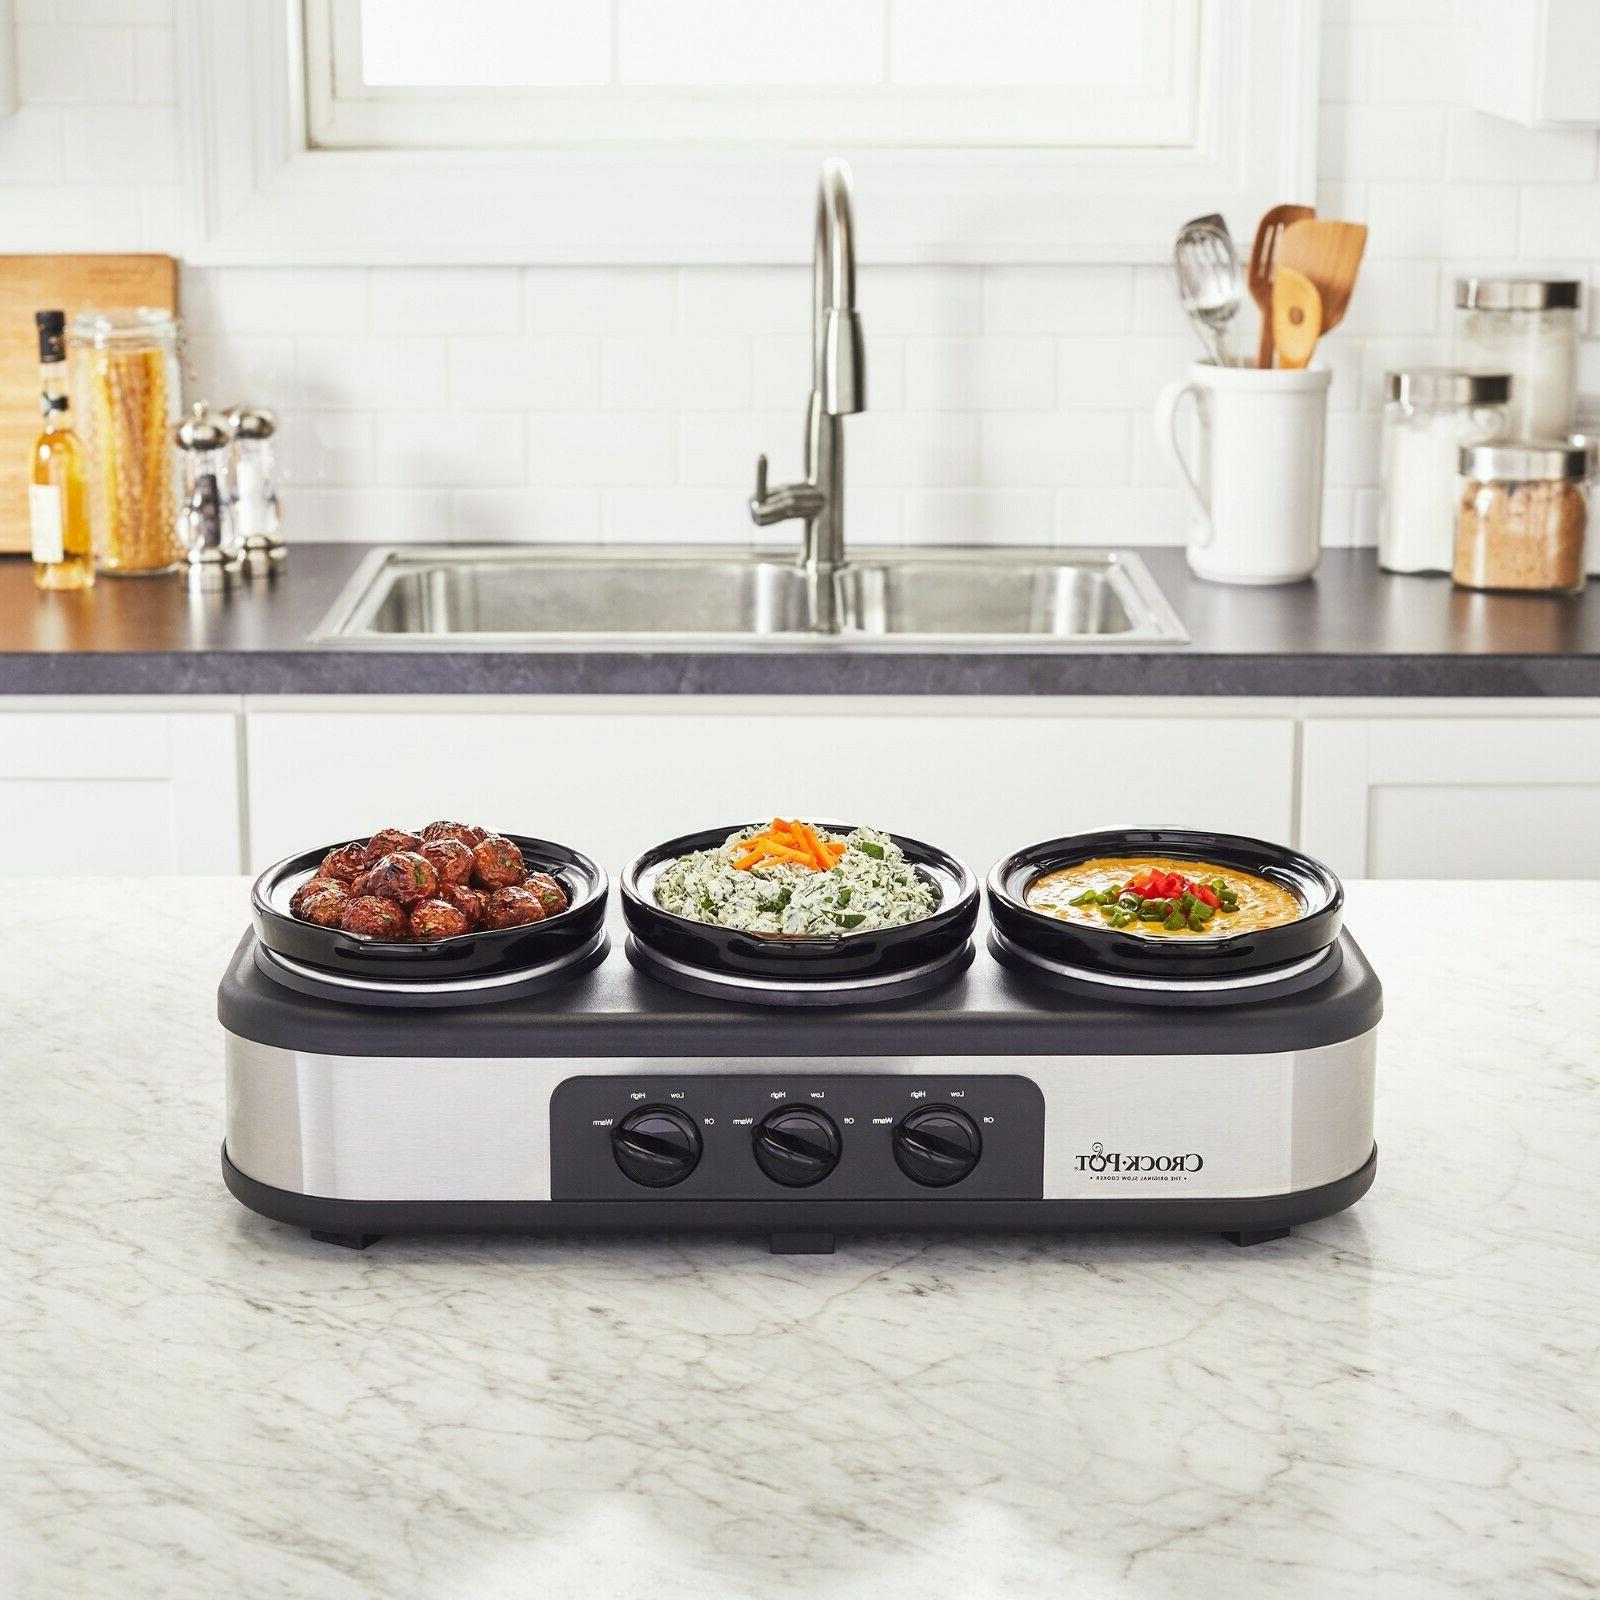 Crock-Pot Serve Slow Cooker Food Warmer, Steel